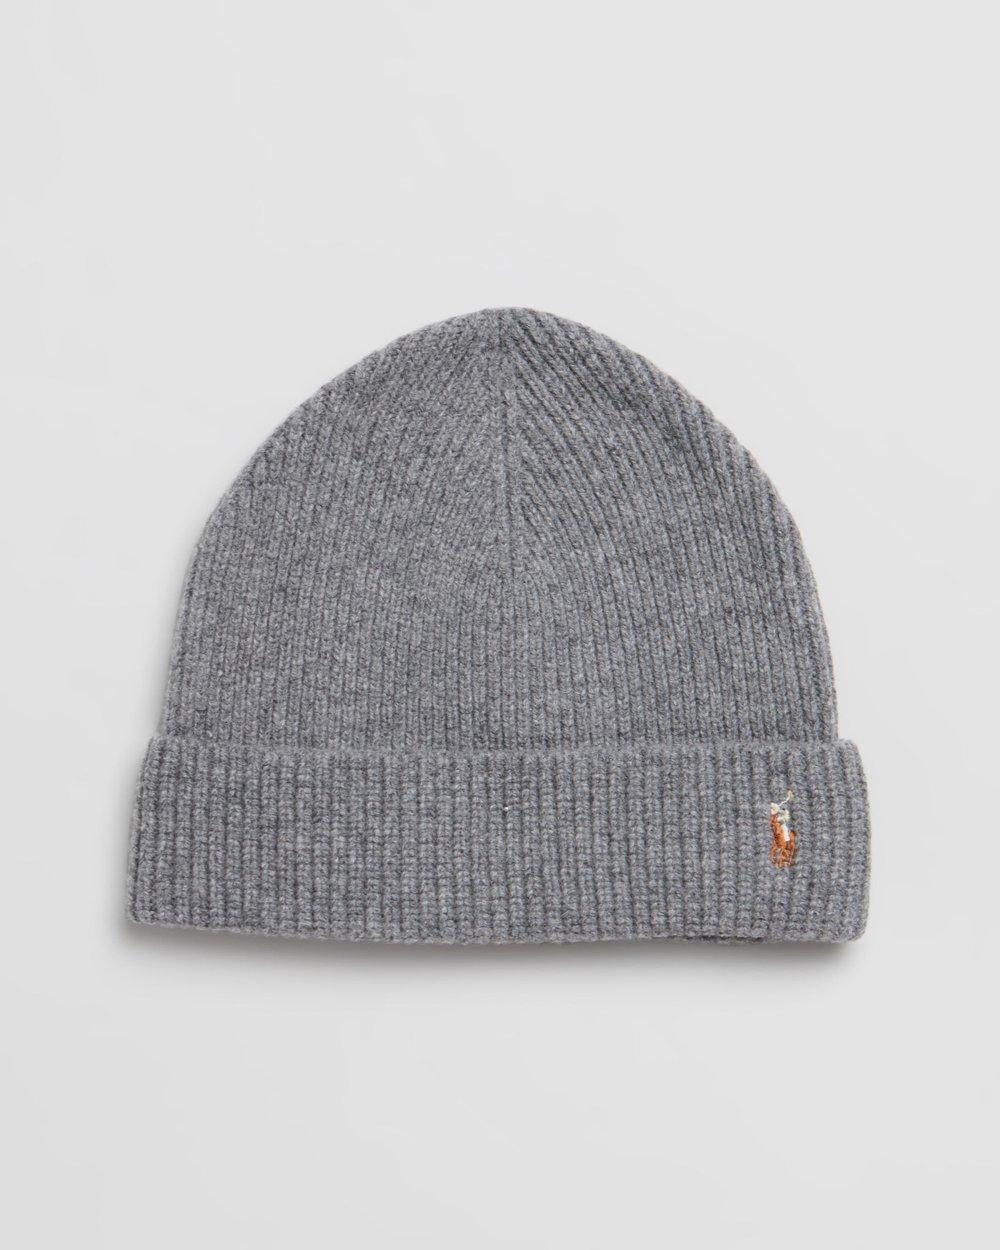 d8a2bae3f7e Signature Merino Cuff Hat by Polo Ralph Lauren Online